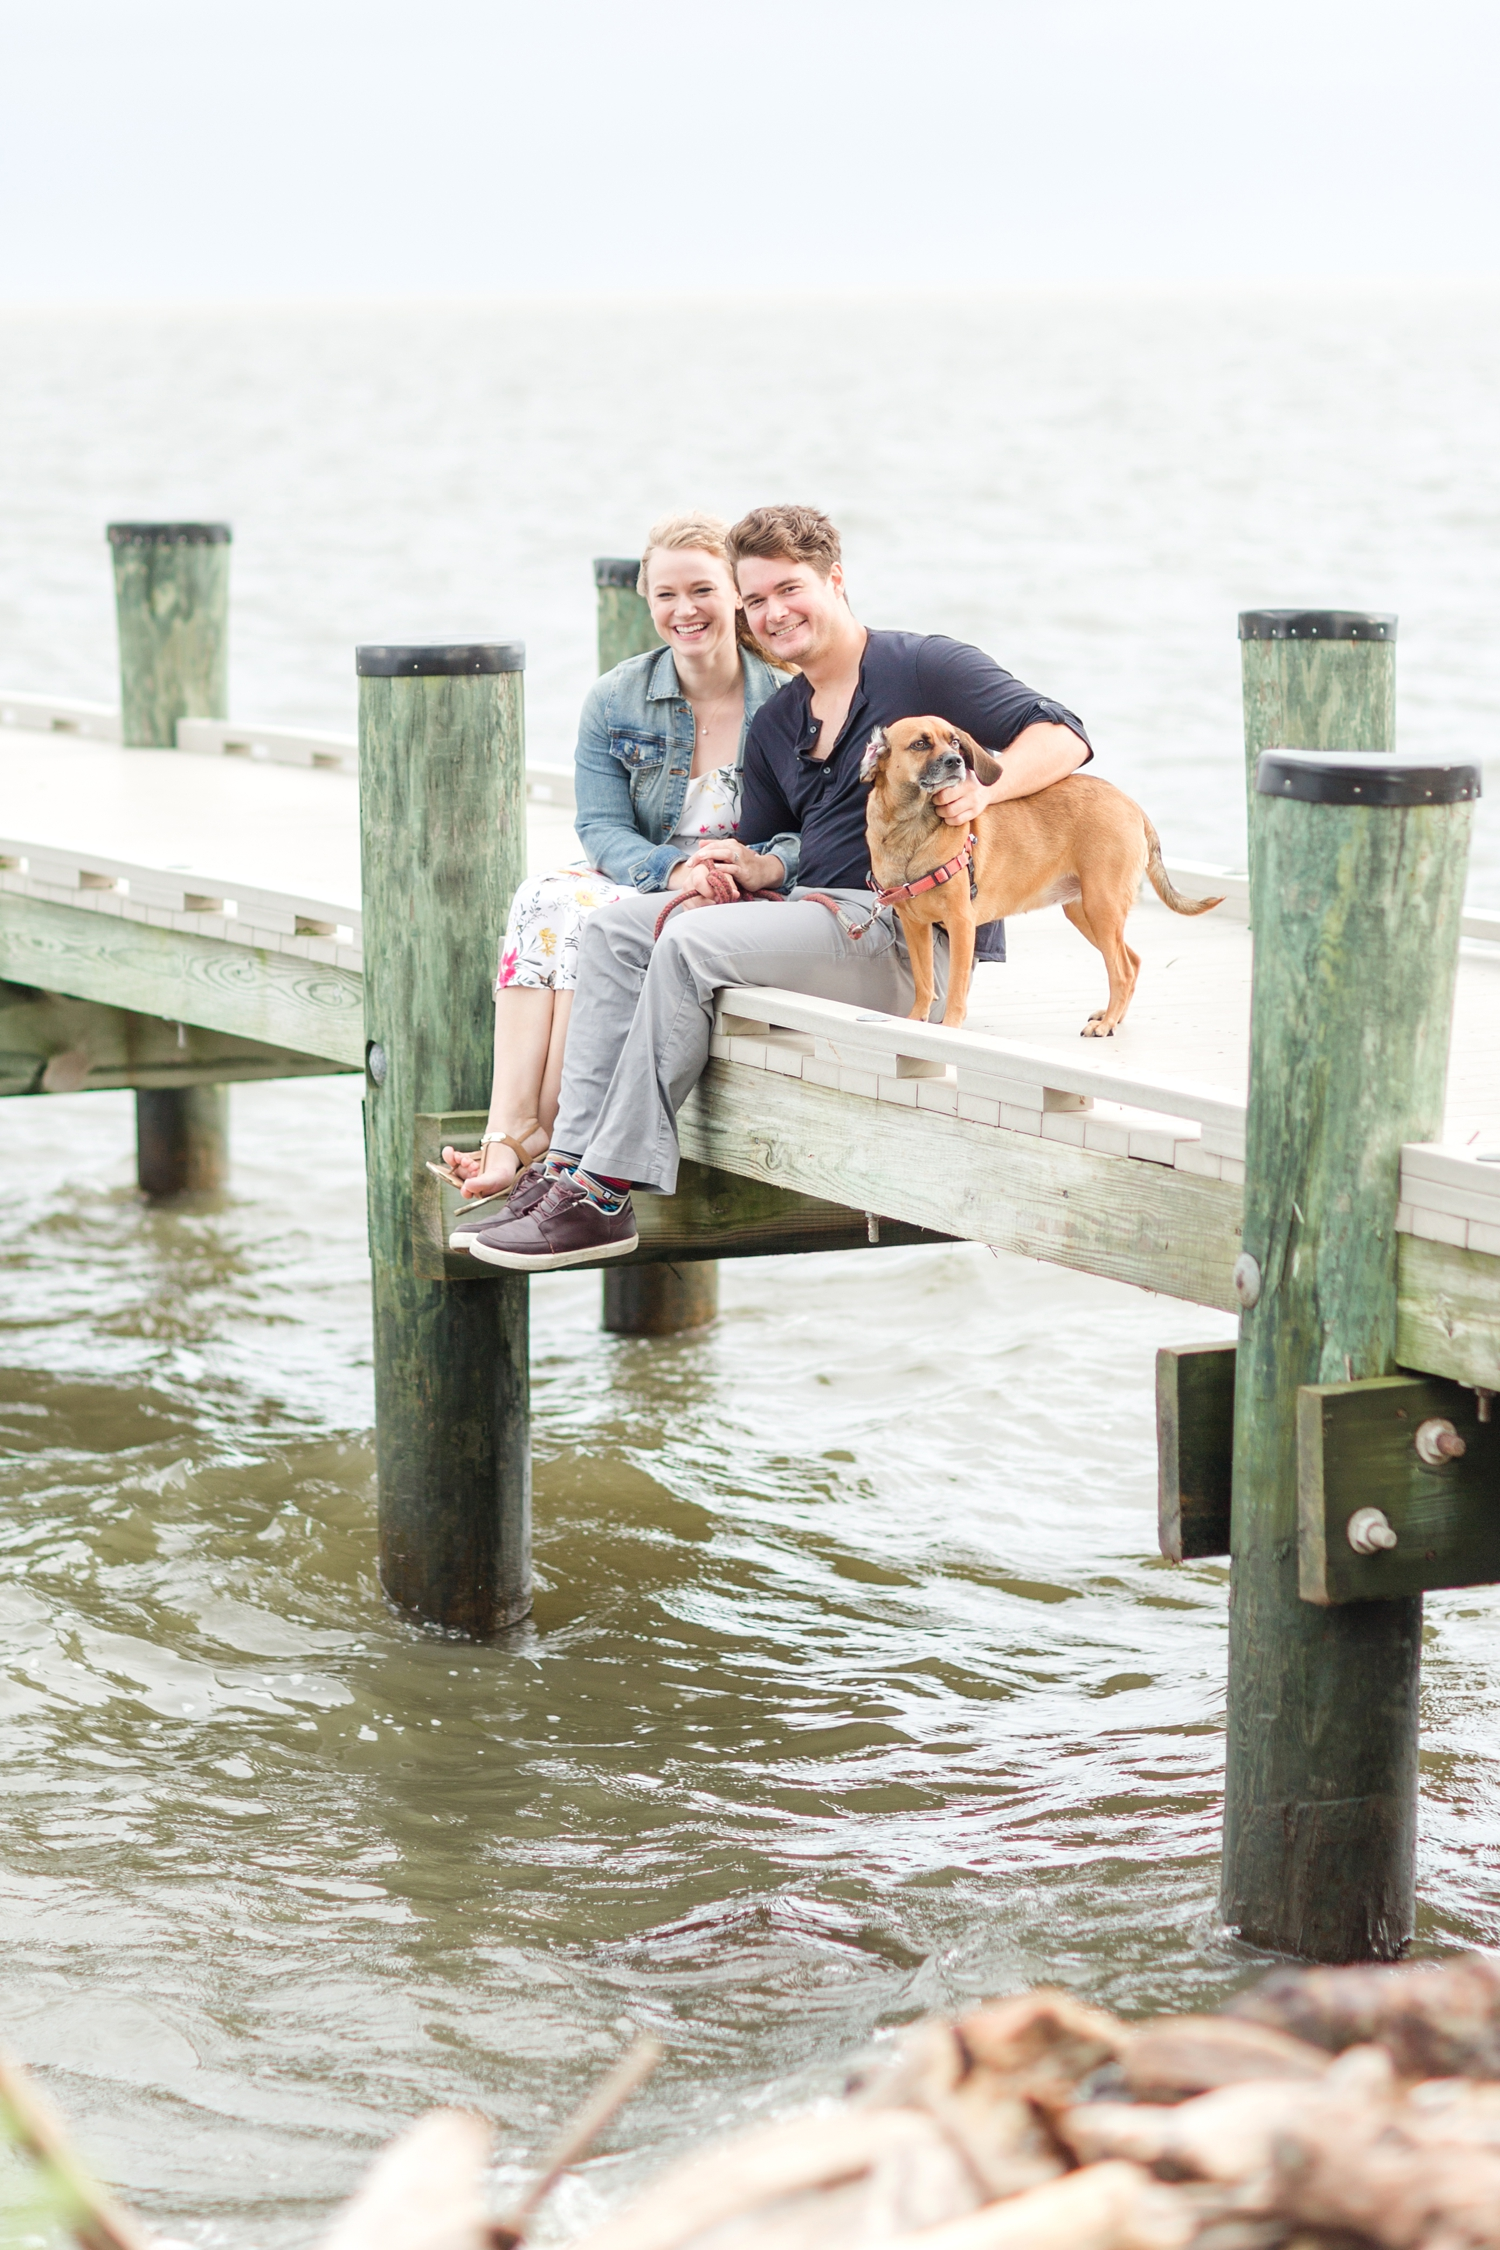 Kirsten & Dan Engagement-29_North-Point-State-Park-Engagement-Maryland-engagement-wedding-photographer-anna-grace-photography-photo.jpg